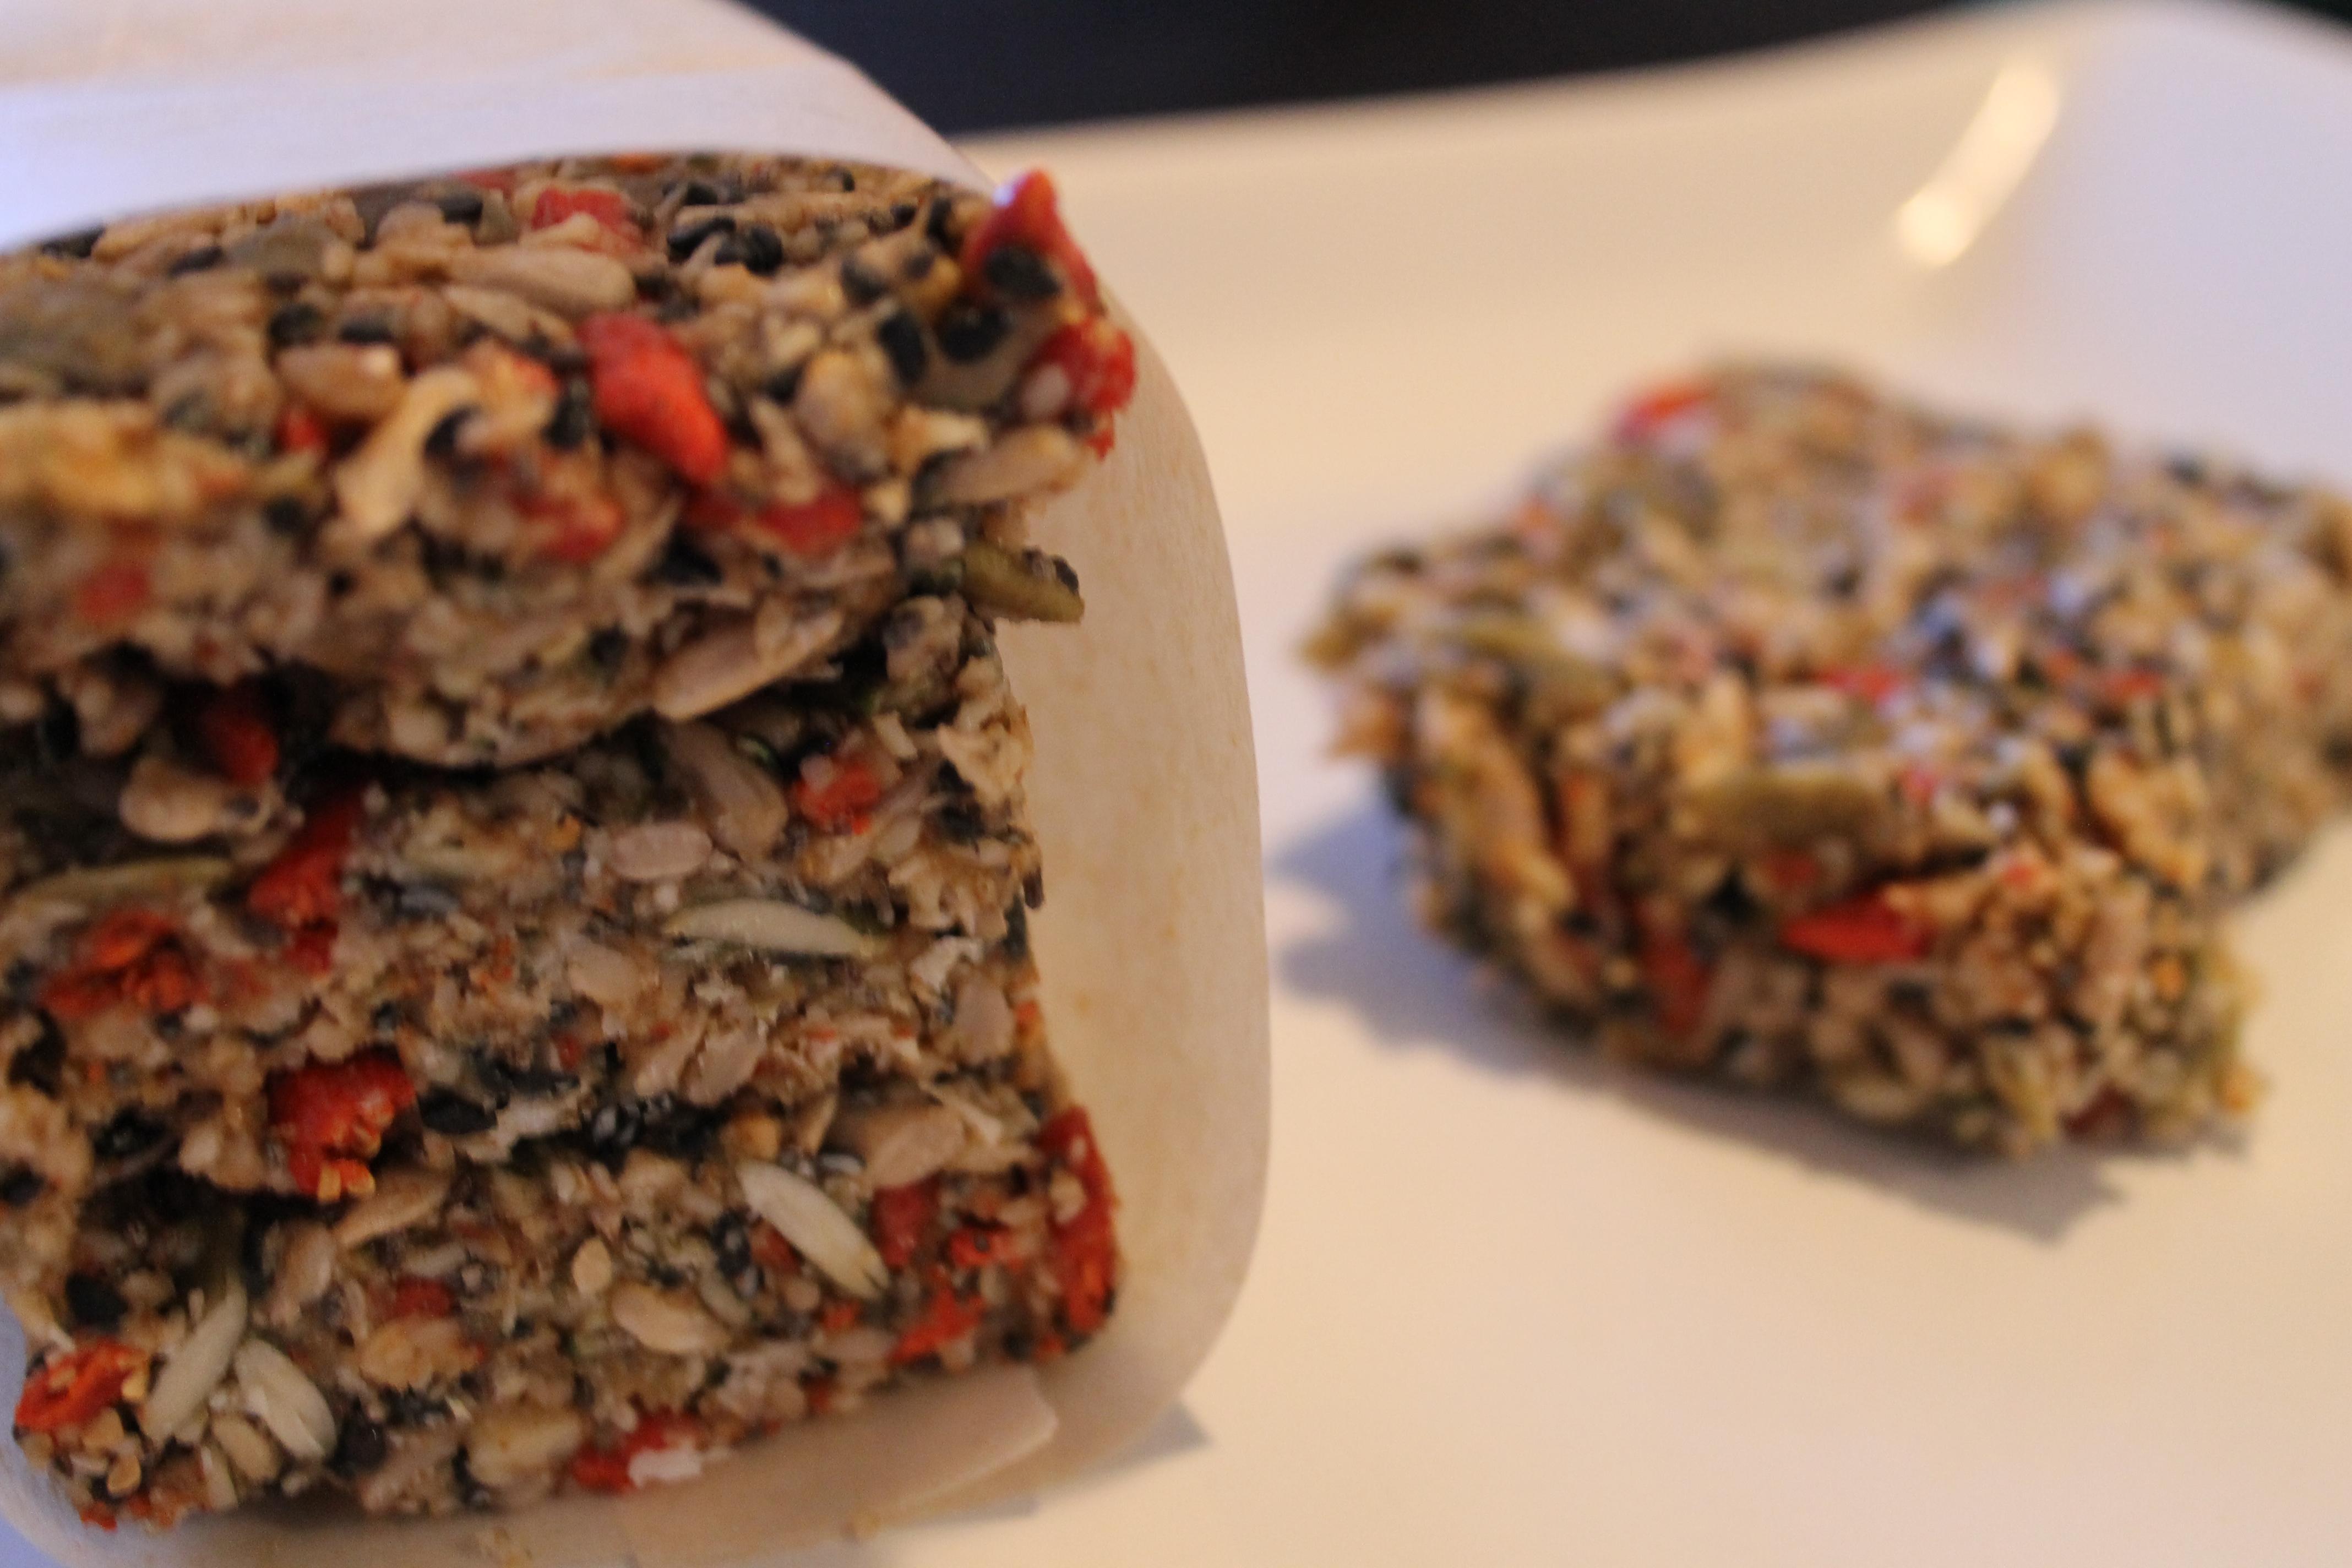 Nutless raw superfood granola bars for Superfood bar